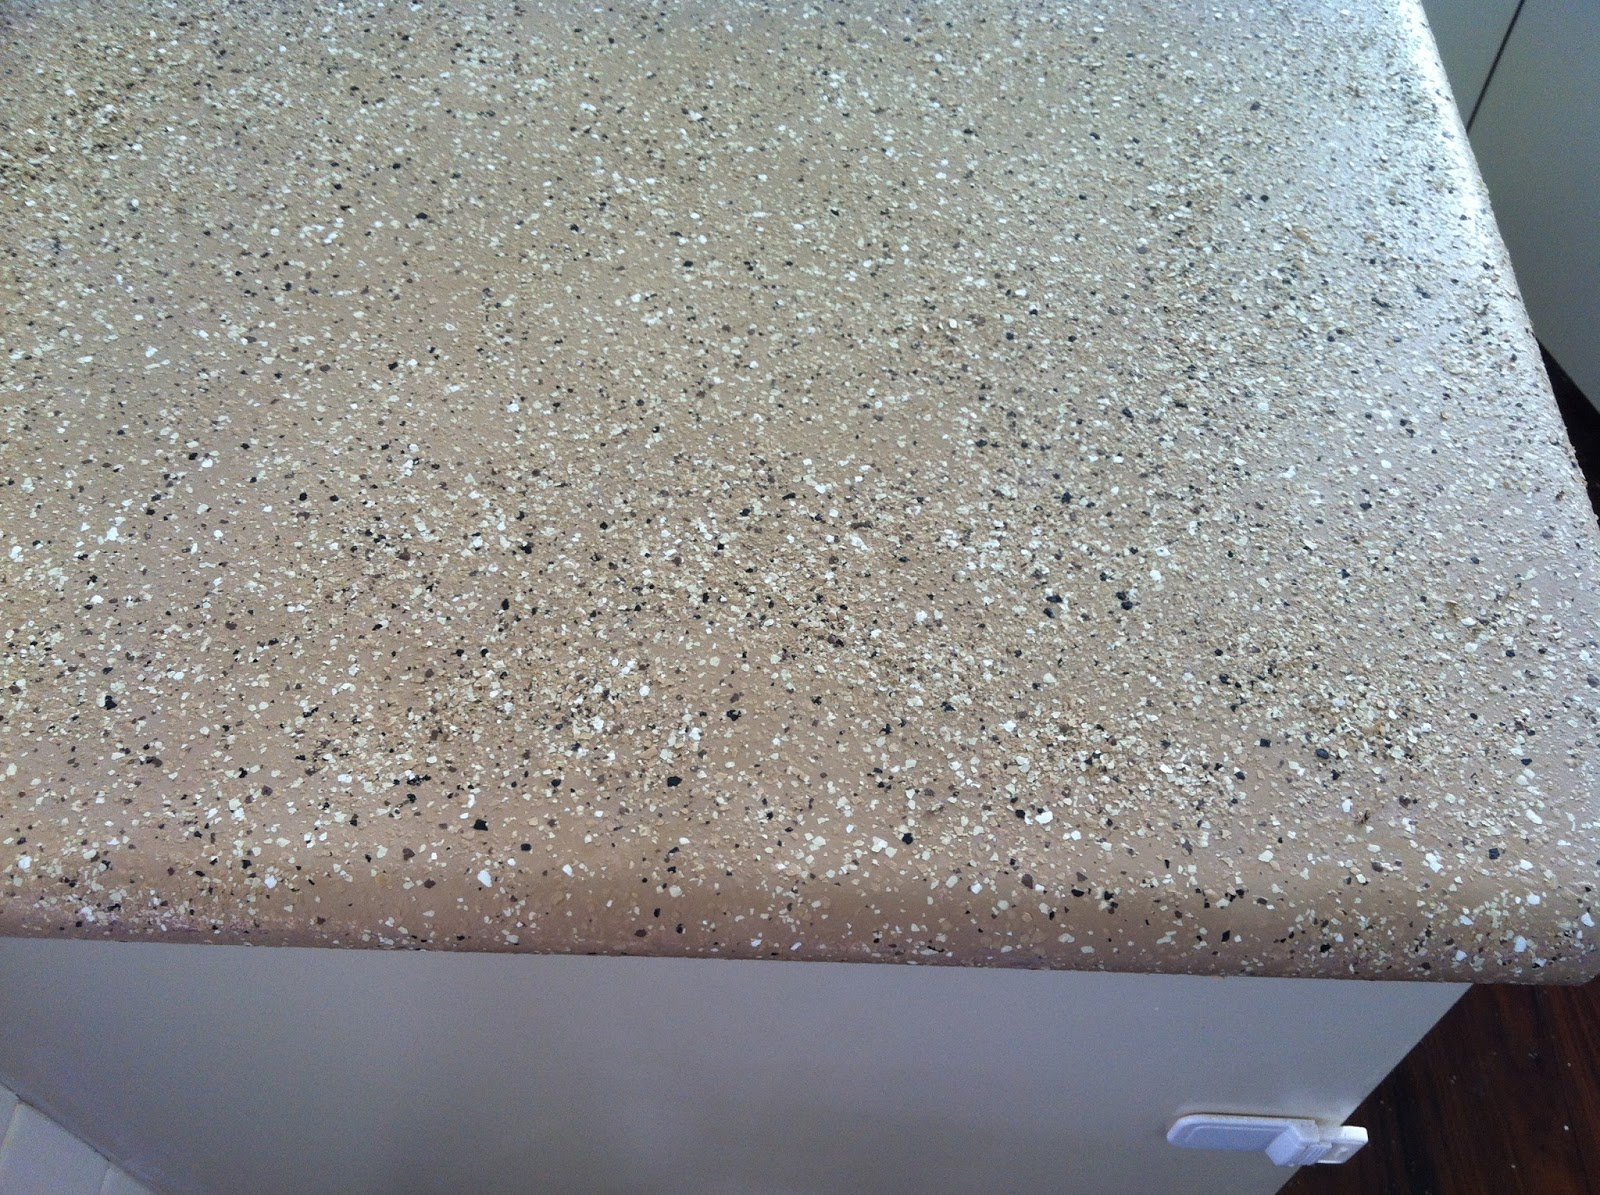 Rust Oleum Countertop Transformations Desert Sand